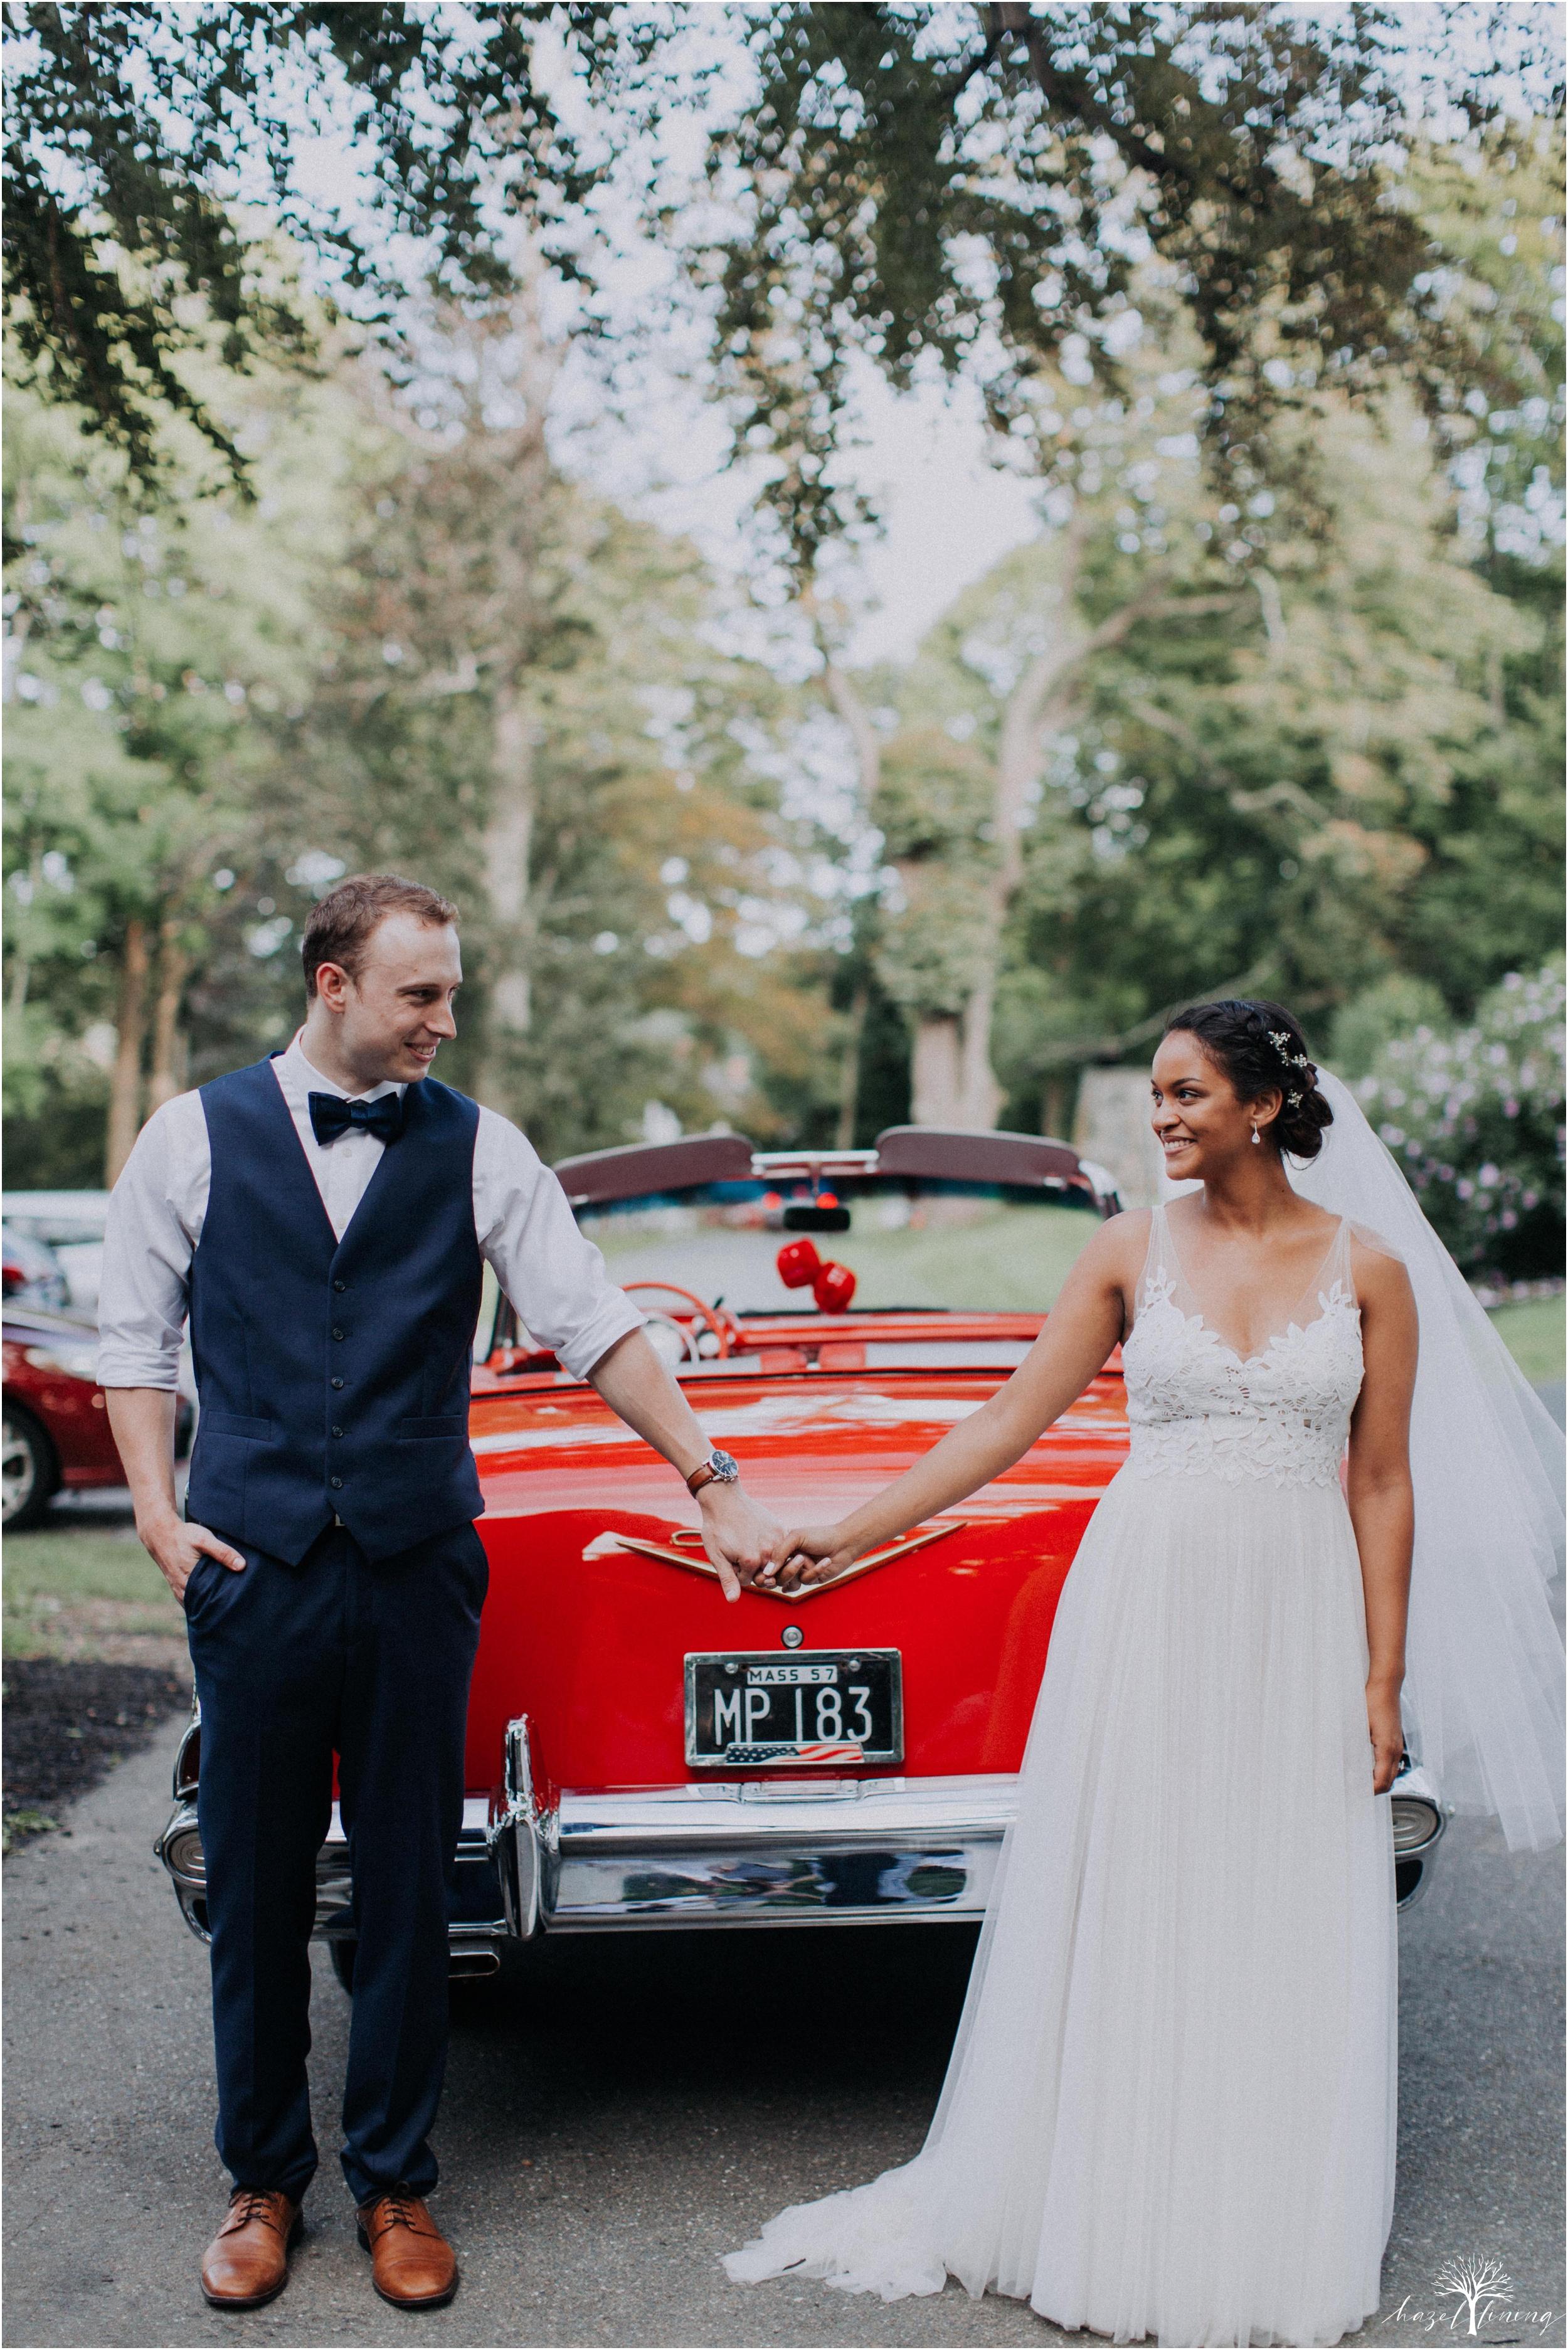 mariah-kreyling-samuel-sherratt-sherrattwiththeworld-peirce-farm-at-witch-hill-boston-massachusetts-wedding-photography-hazel-lining-travel-wedding-elopement-photography_0200.jpg